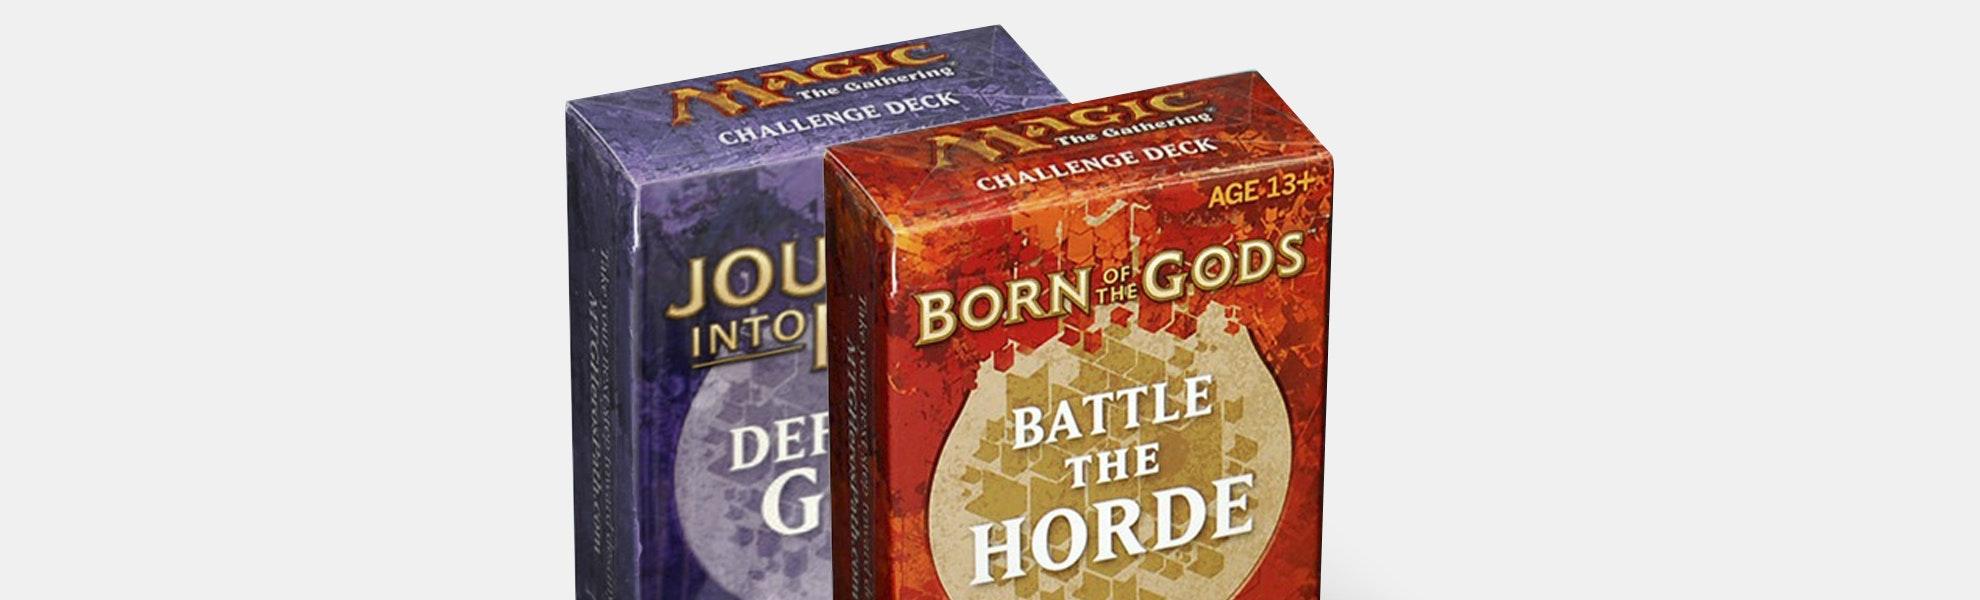 Born of the Gods & Journey Into Nyx Challenge Decks